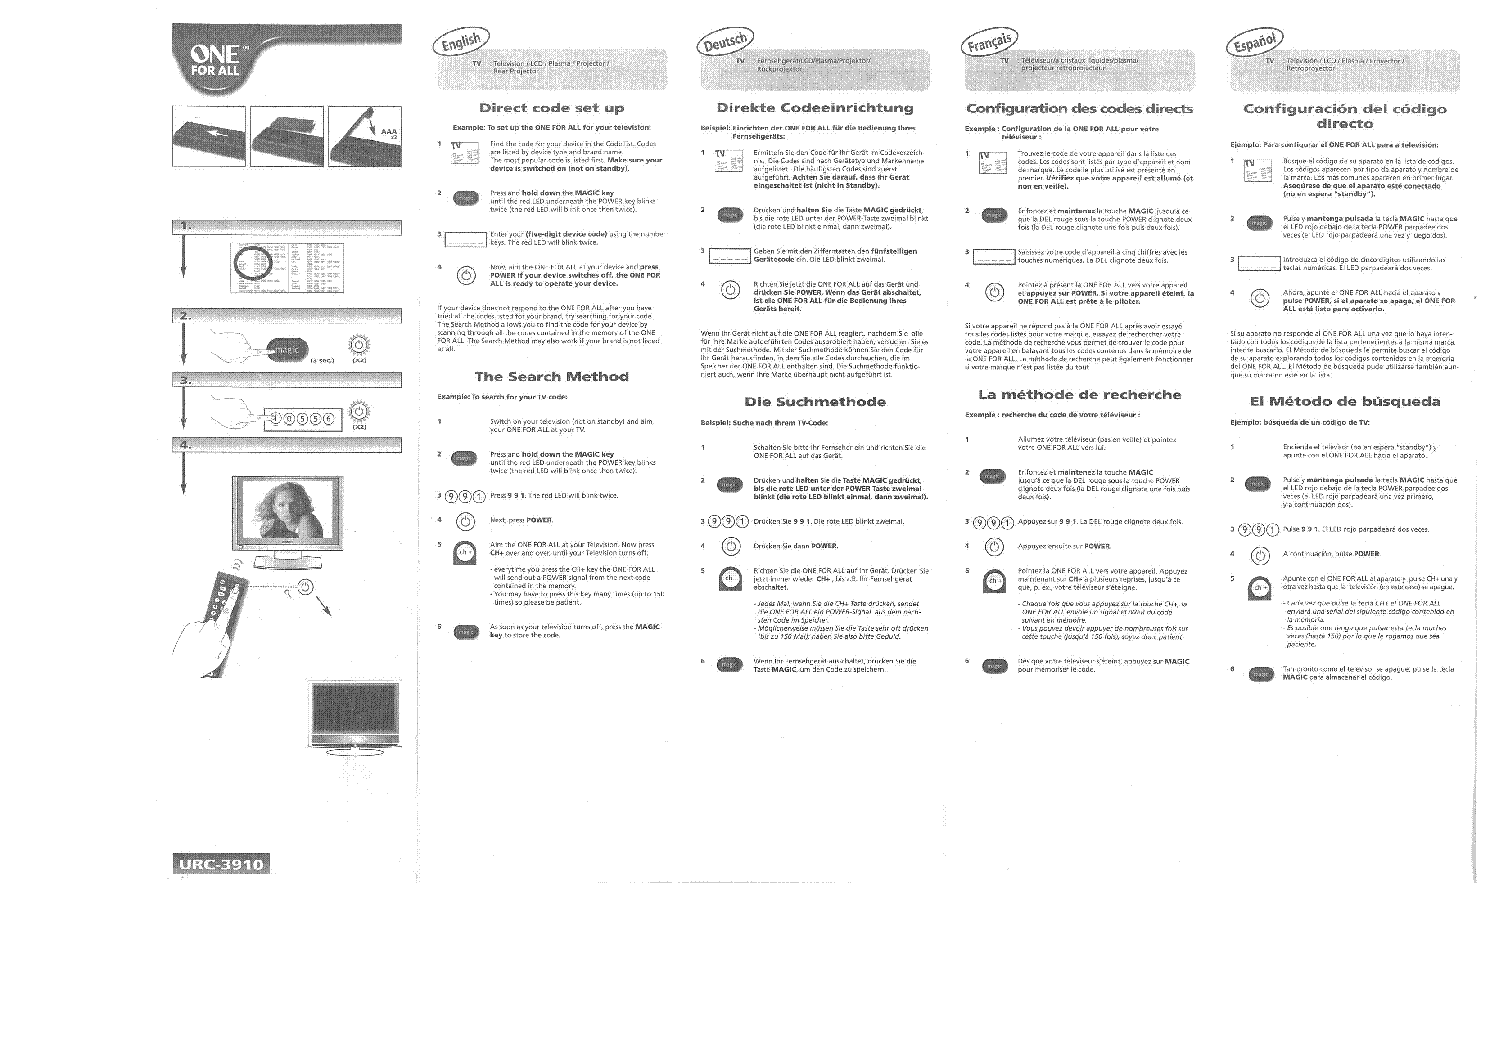 One For All Urc3910 De En Fr Nl Hu Service Manual Download